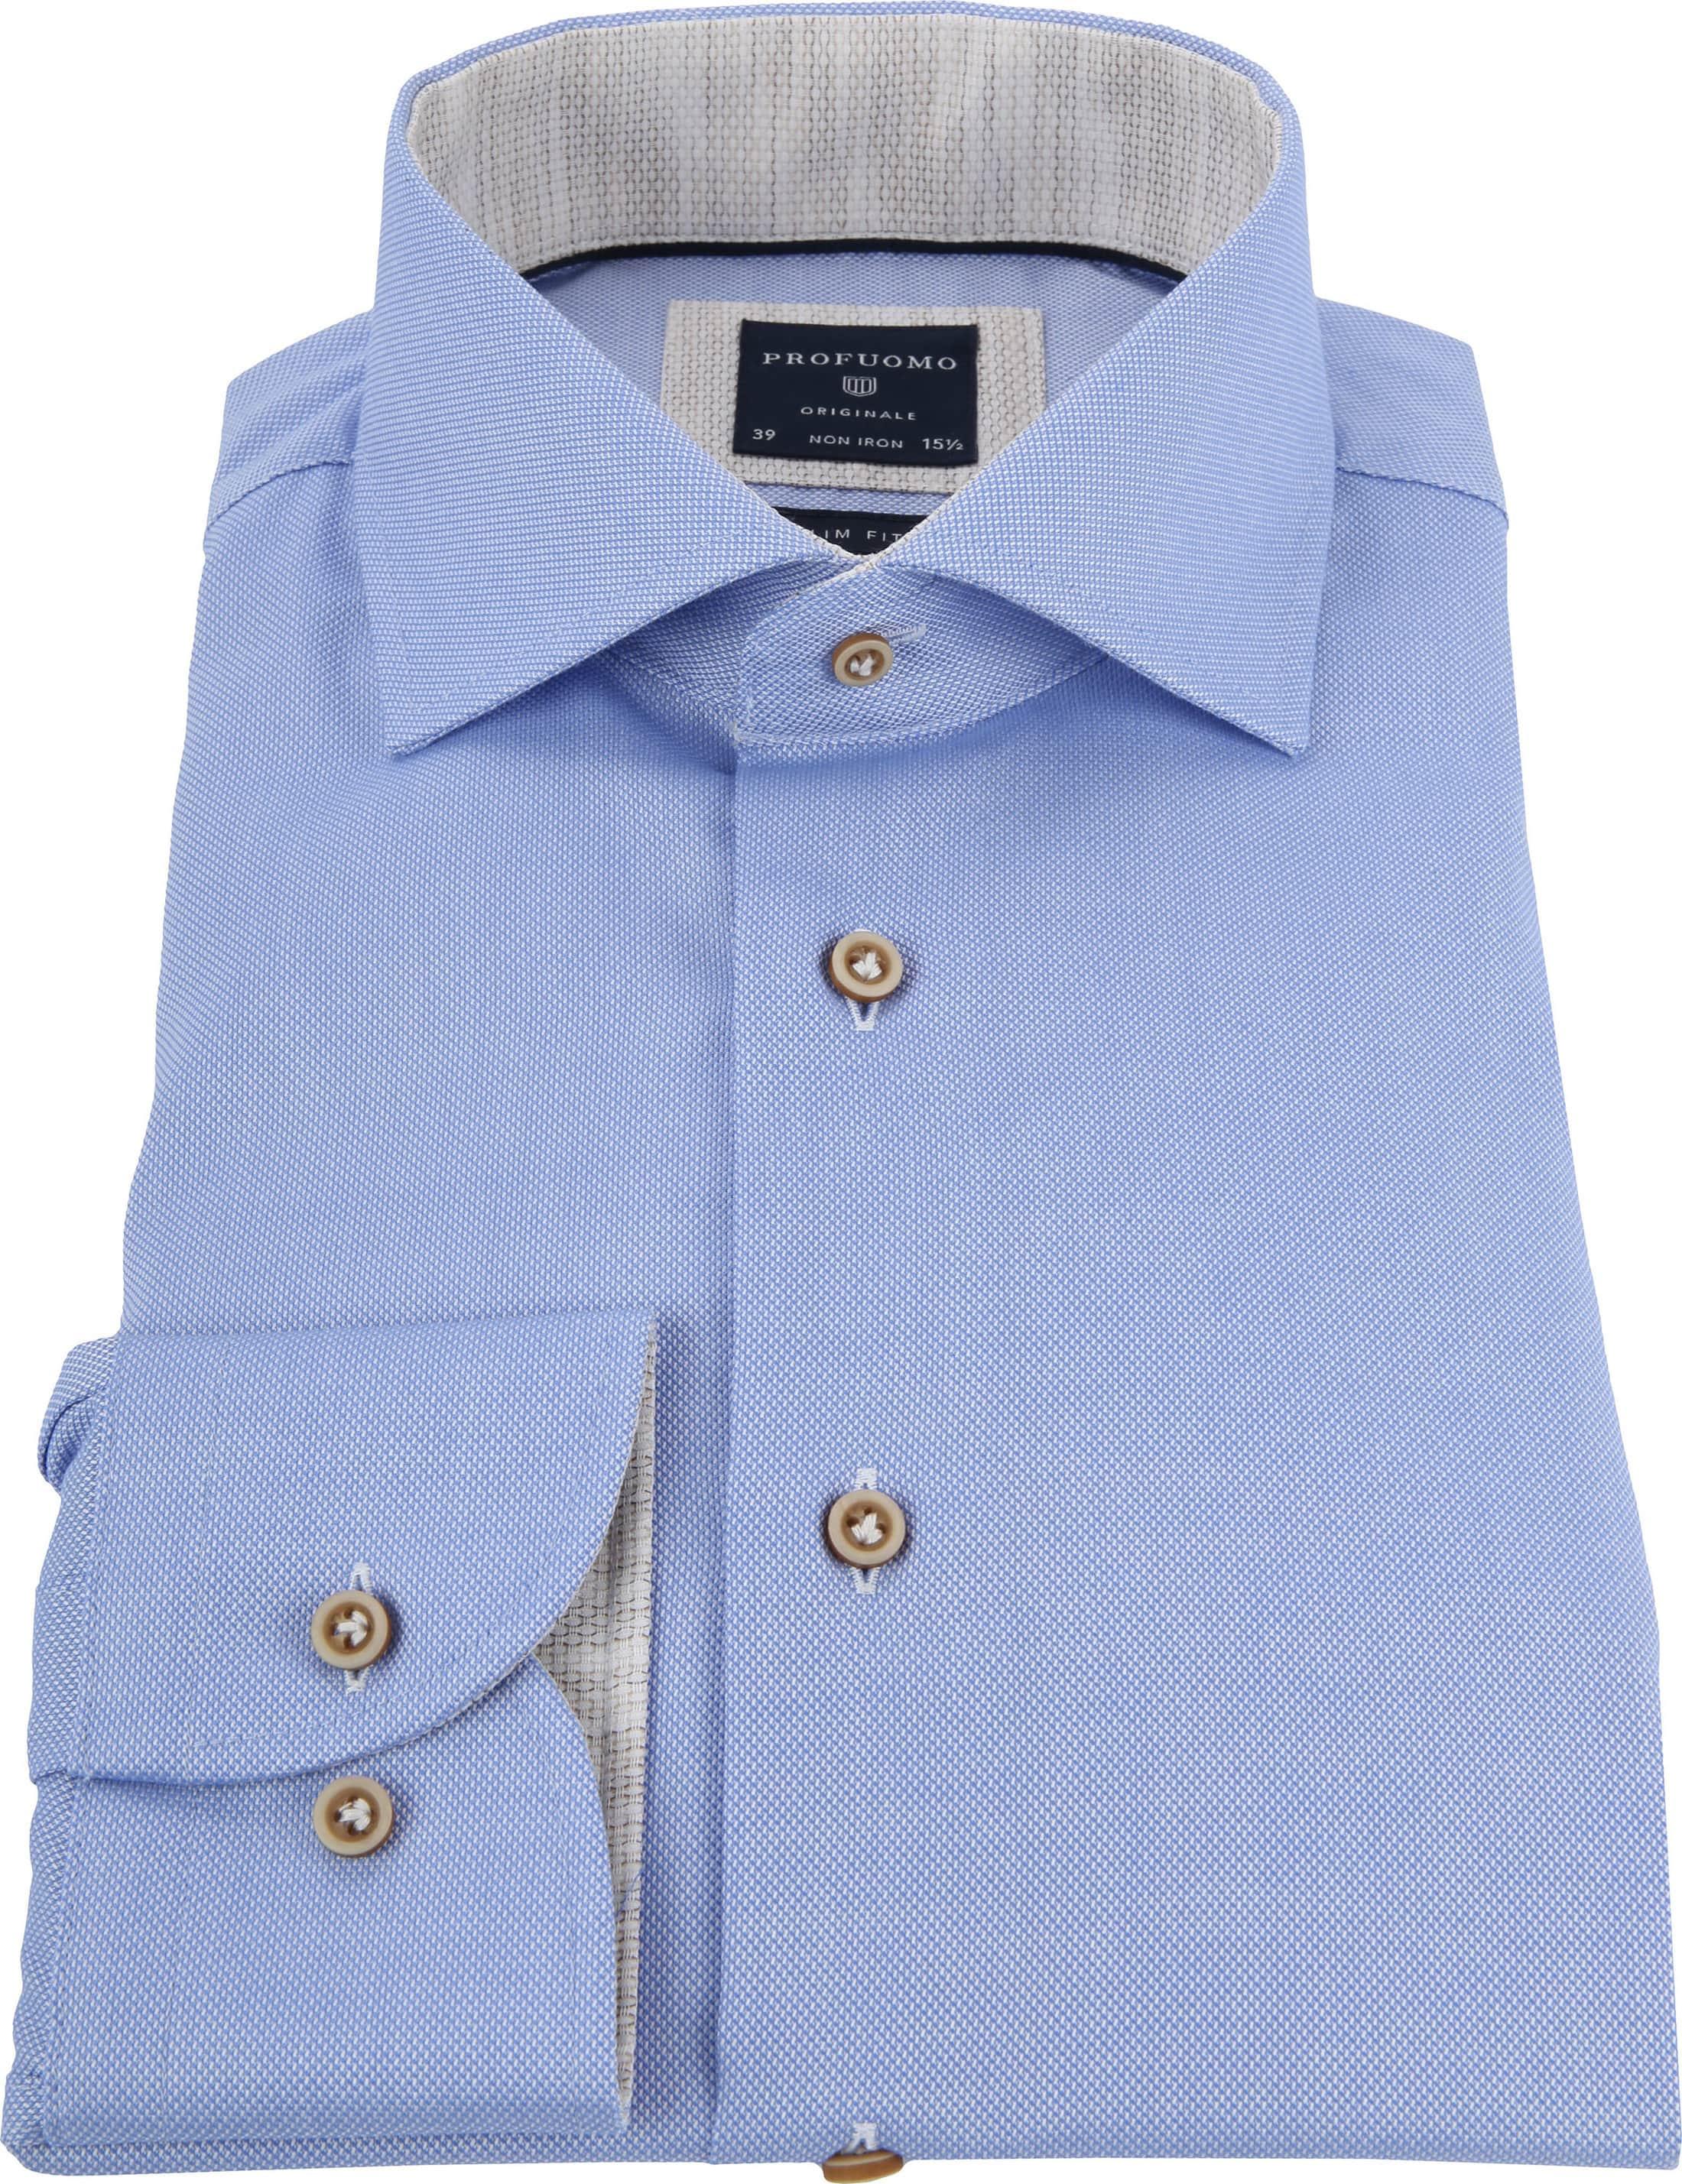 Profuomo Overhemd Blauw CAW foto 3